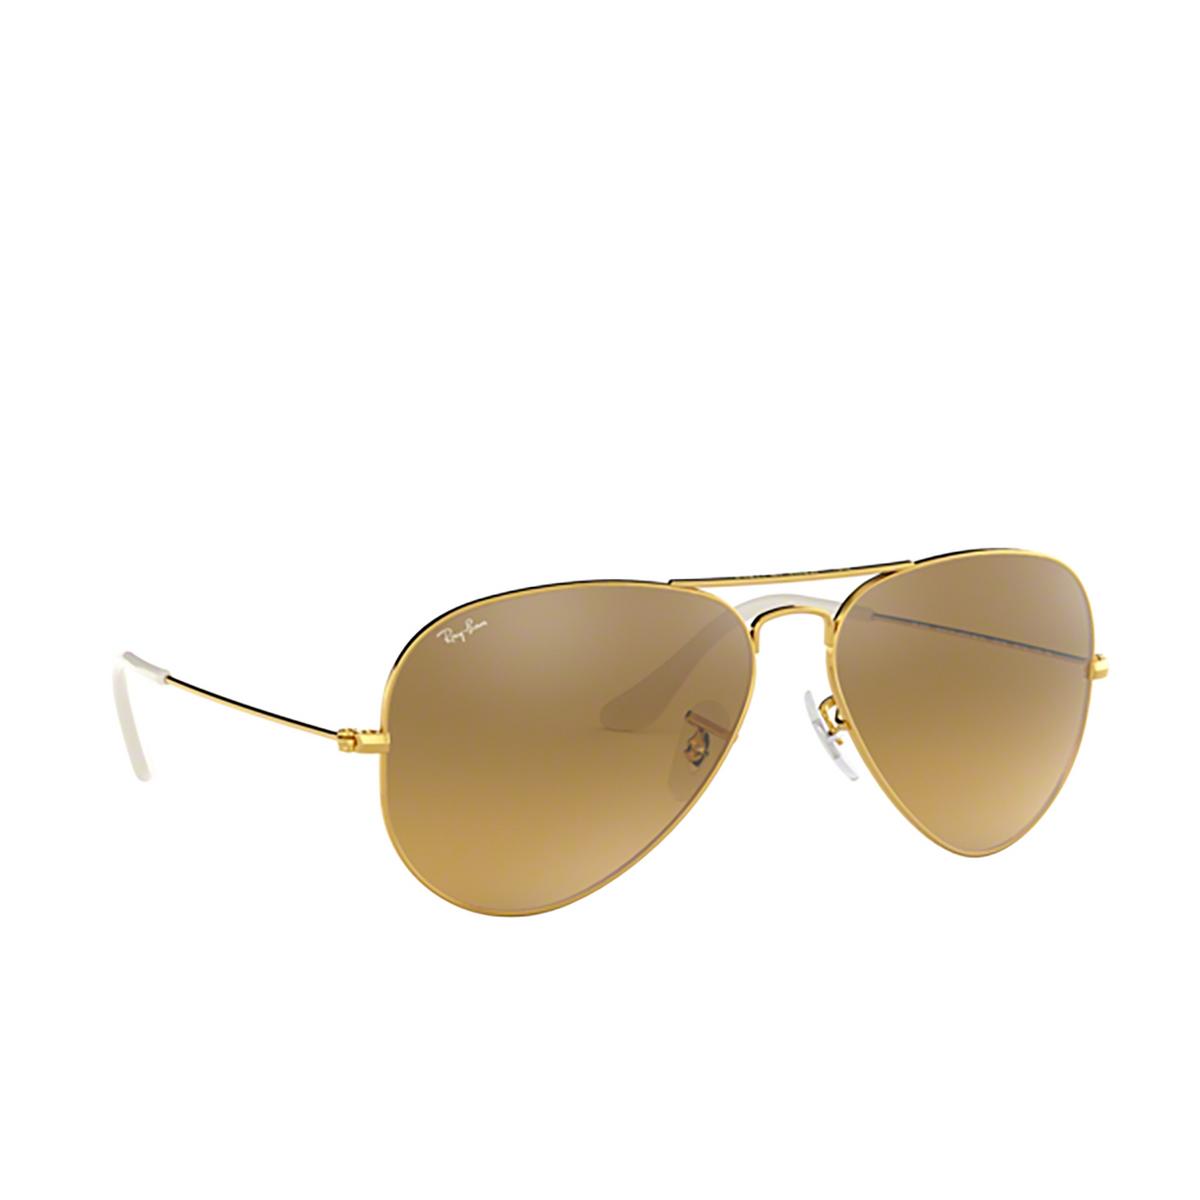 Ray-Ban® Aviator Sunglasses: Aviator Large Metal RB3025 color Arista 001/3K - three-quarters view.